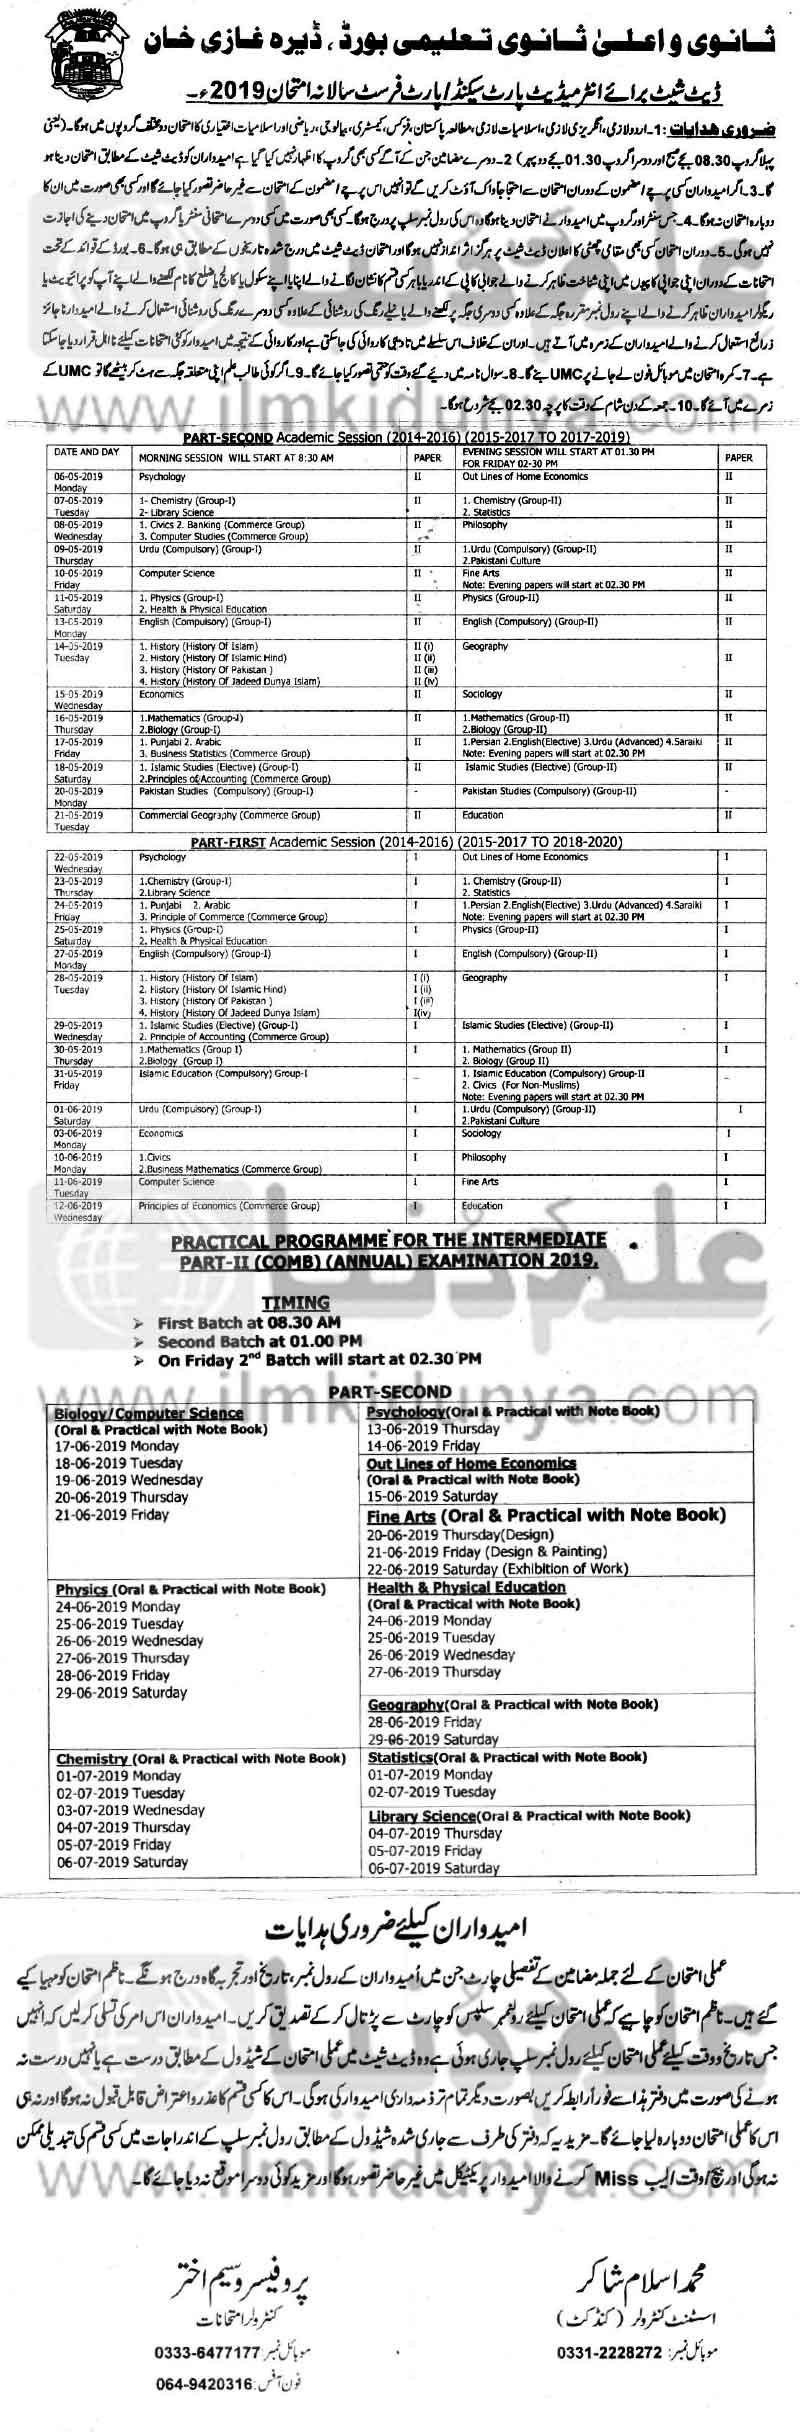 BISE DG Khan Board FA FSc Date Sheet 2019 Part 1, 2